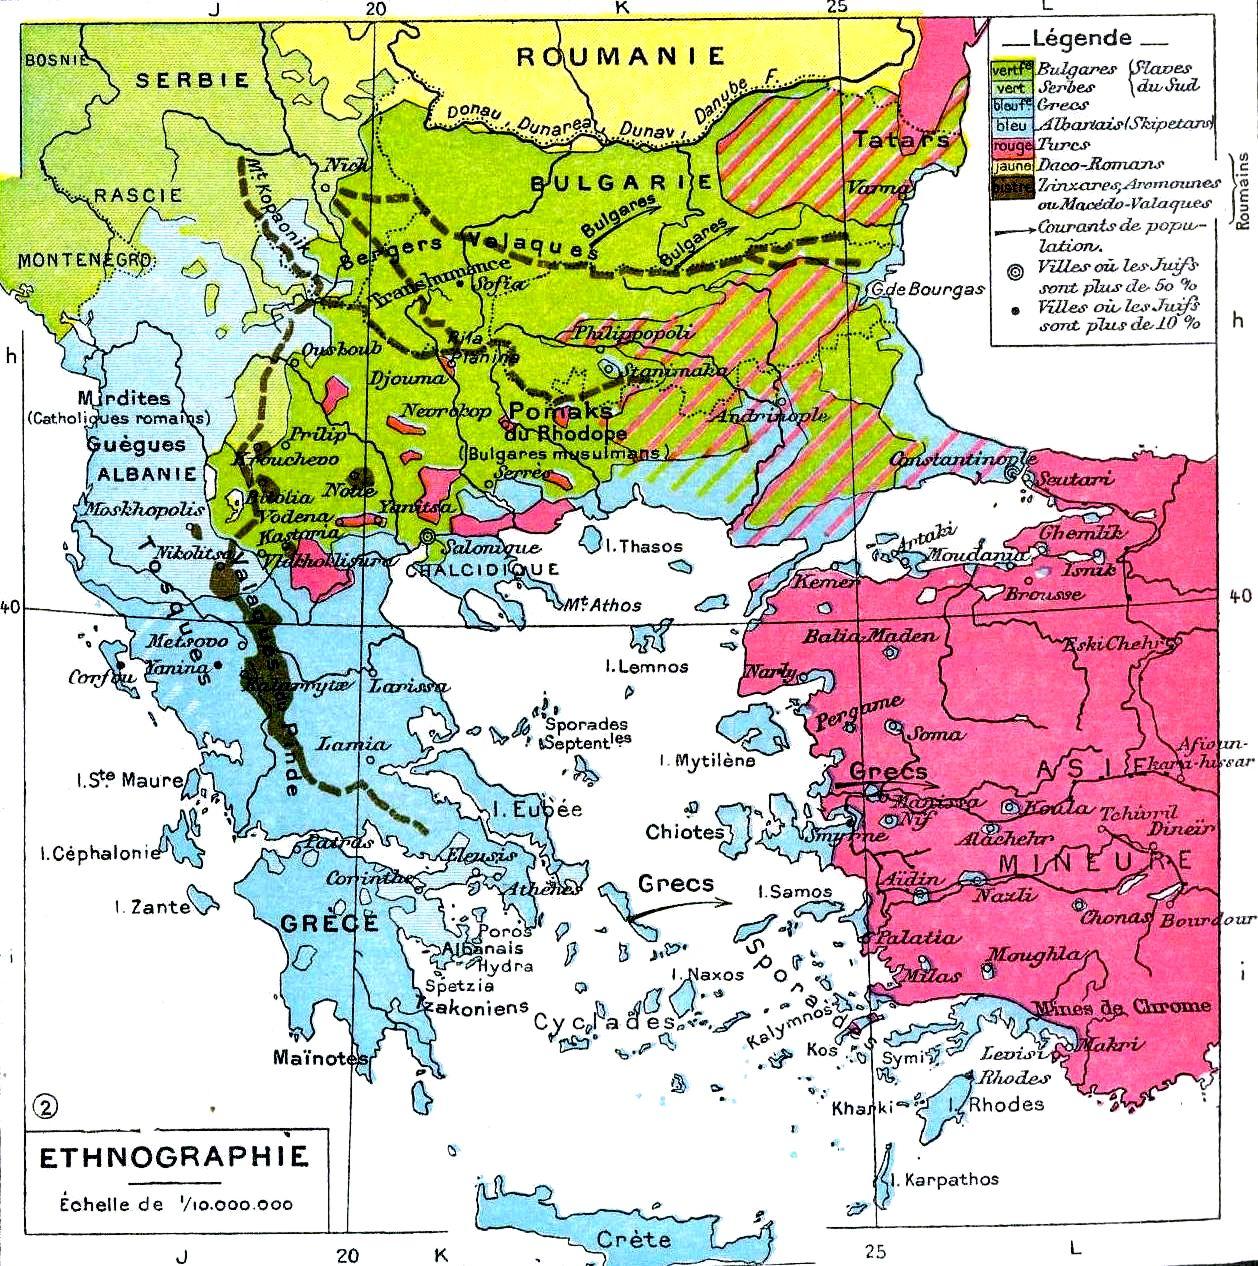 1914 Balkan Ethnicity Map Prior To Fyrom Bulgarians Becoming Descendants Of Alexander The Macedon Europe